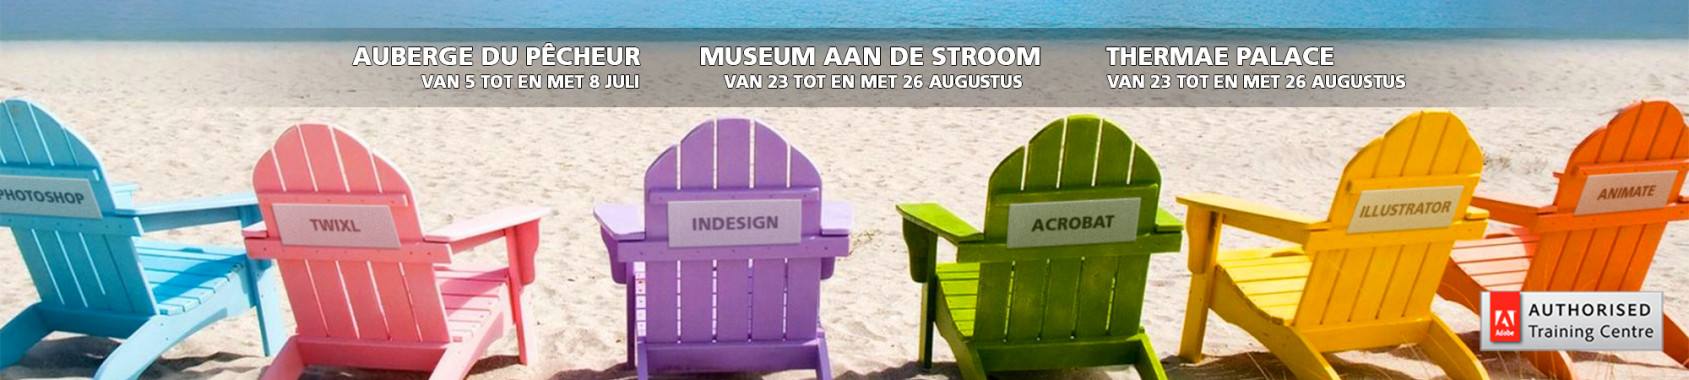 Summercamp3.jpg